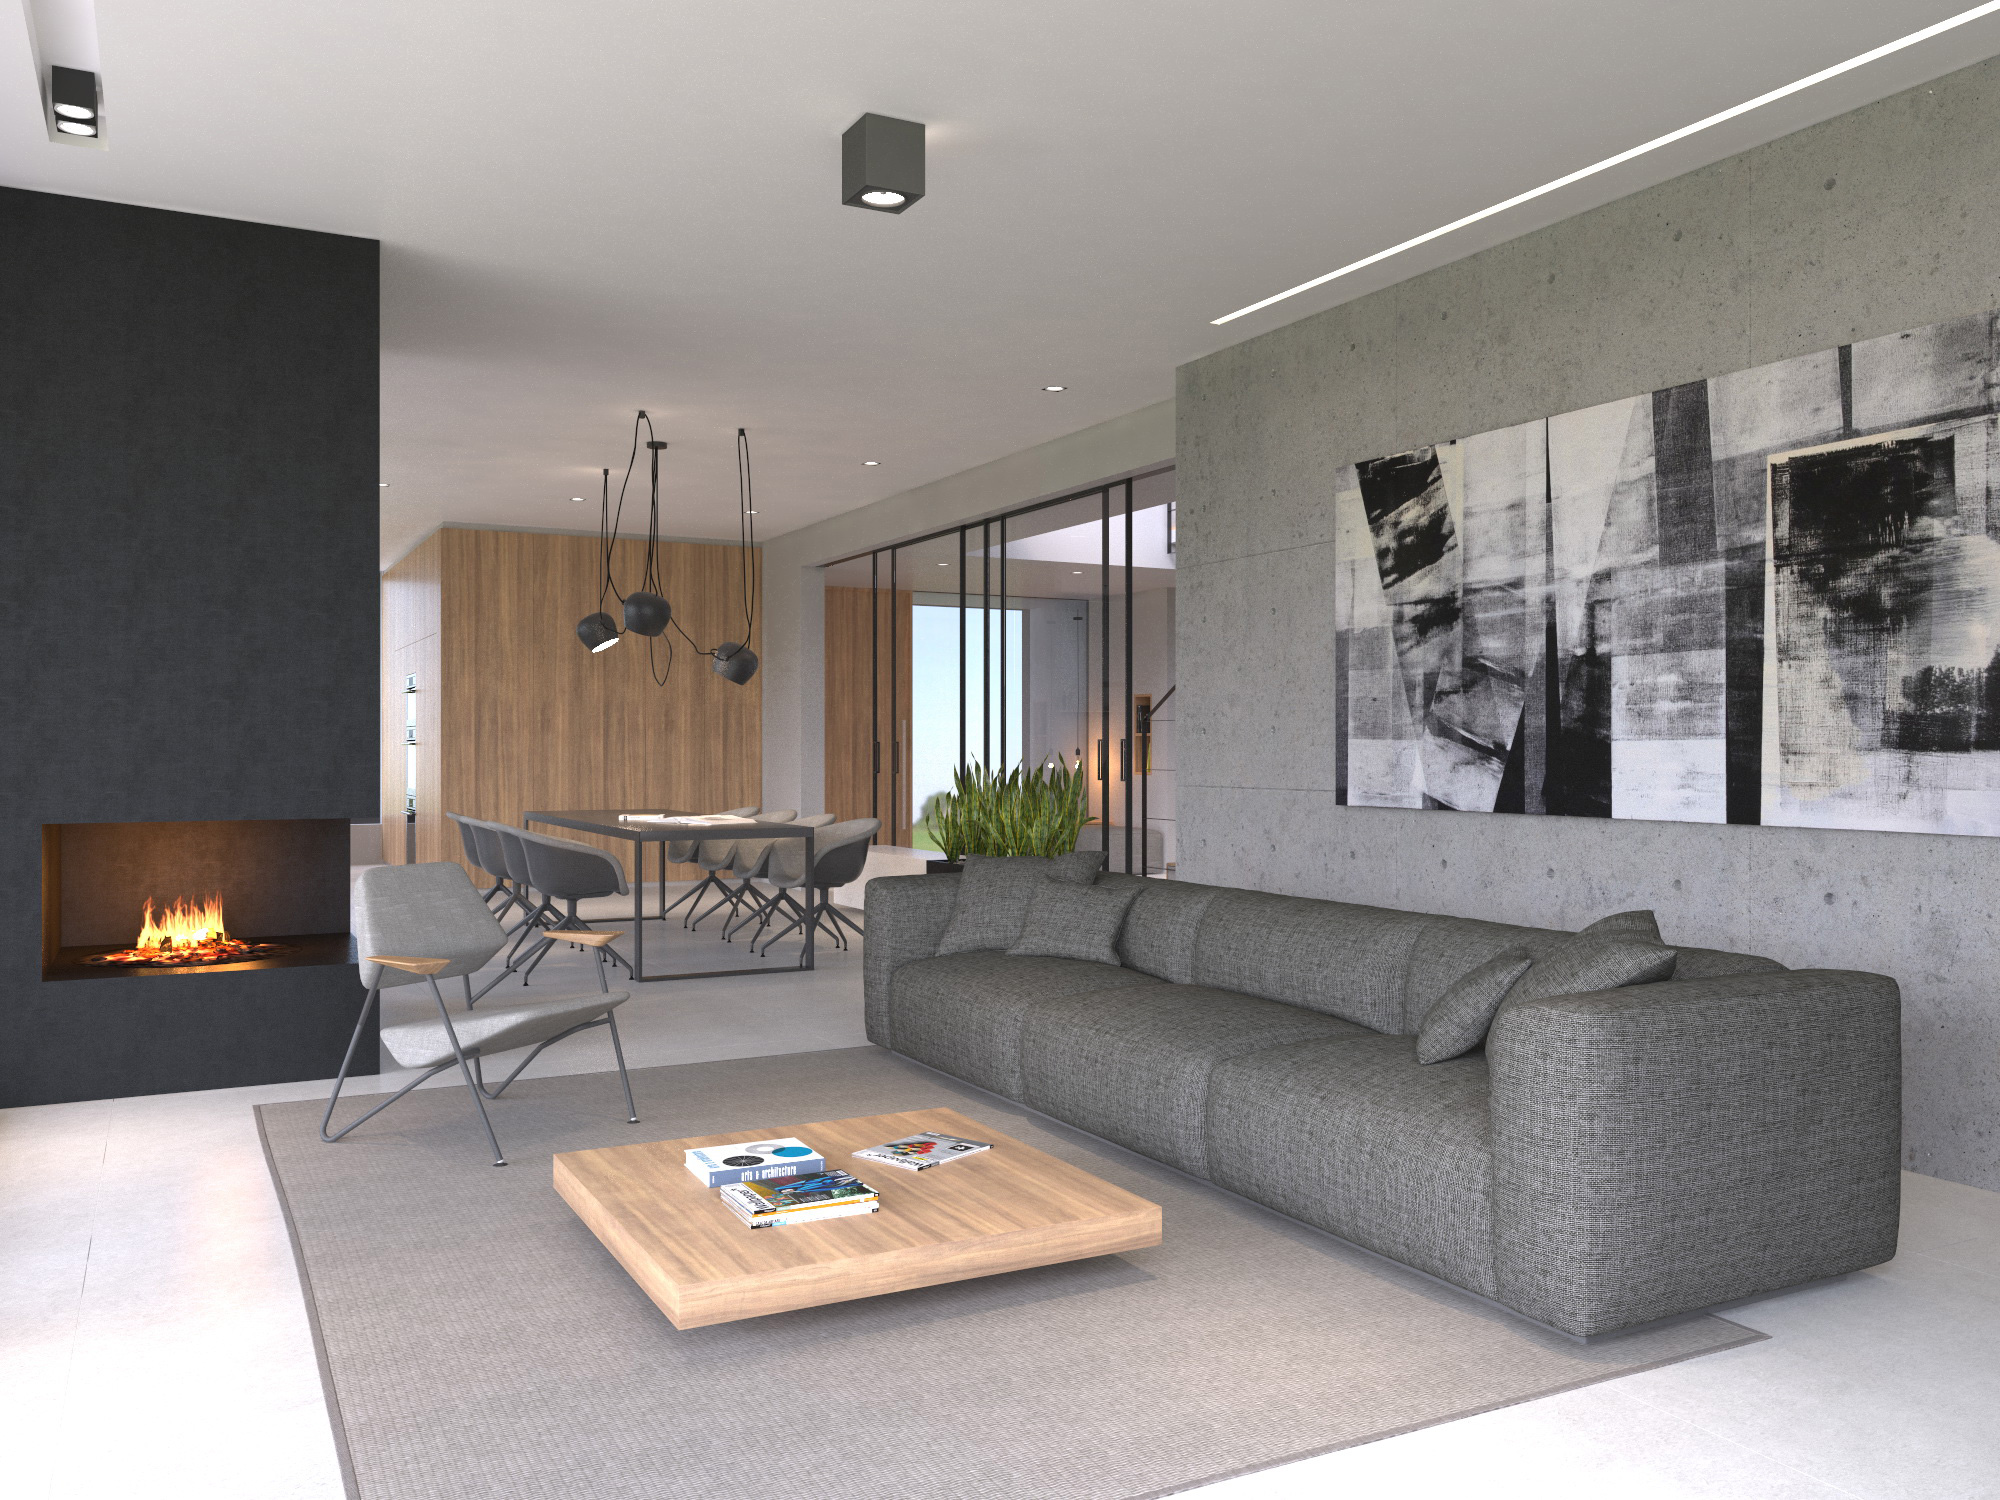 mt-house-interior-04